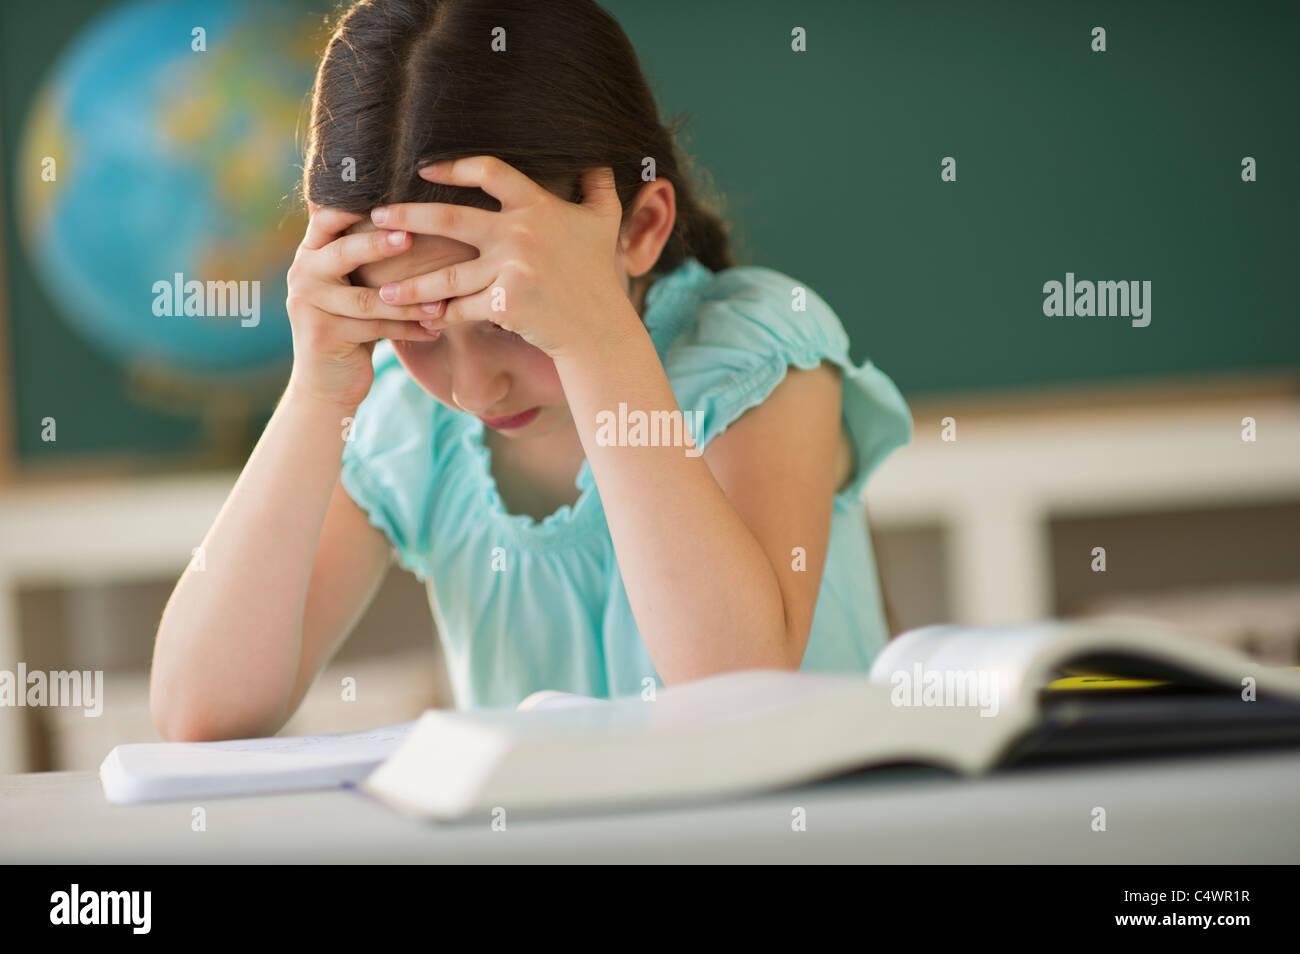 USA,New Jersey,Jersey City,schoolgirl (8-9) reading book - Stock Image